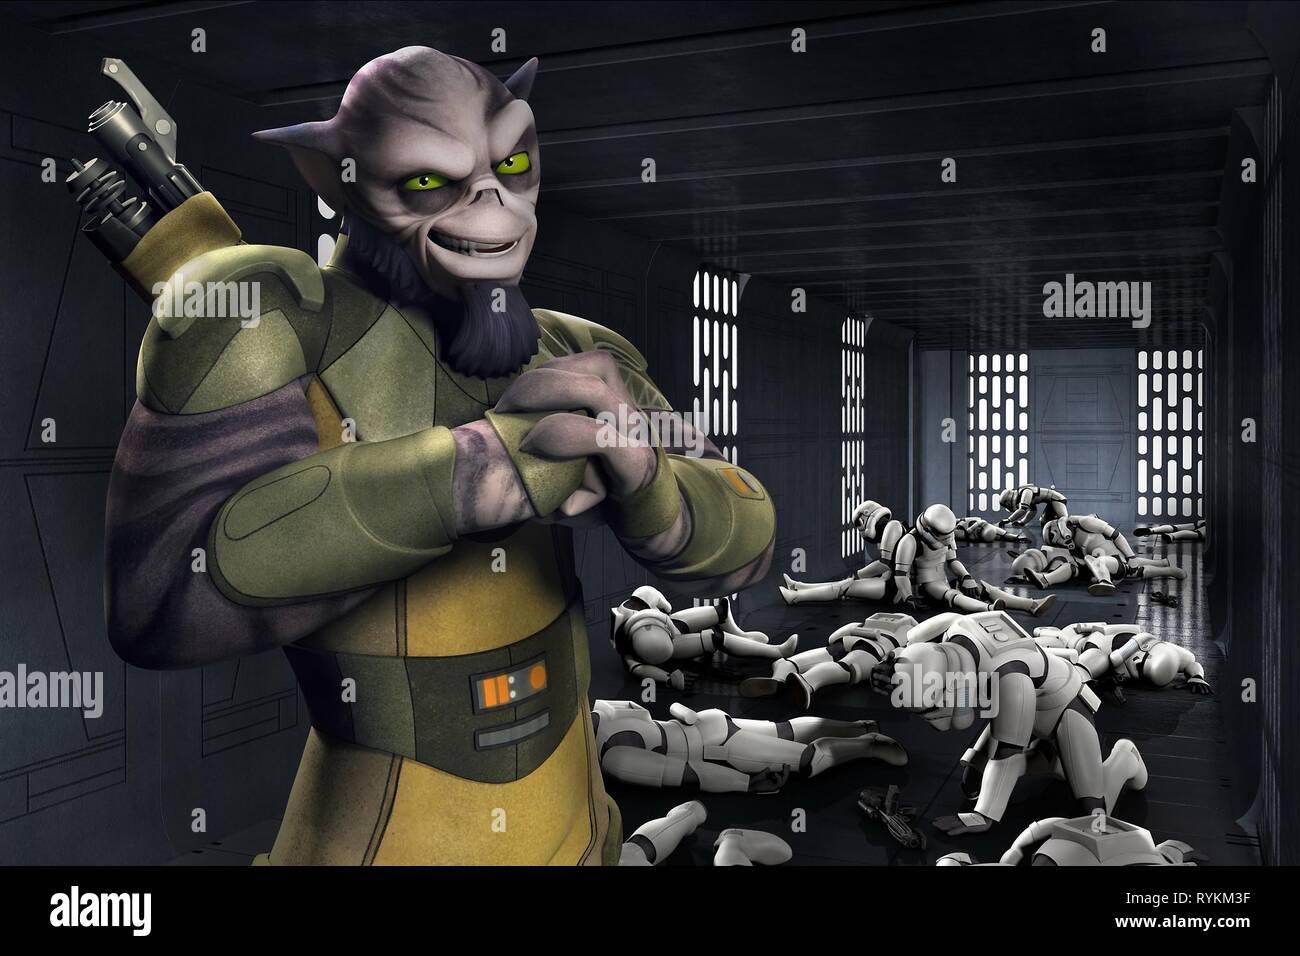 ZEB, STAR WARS REBELS, 2014 - Stock Image